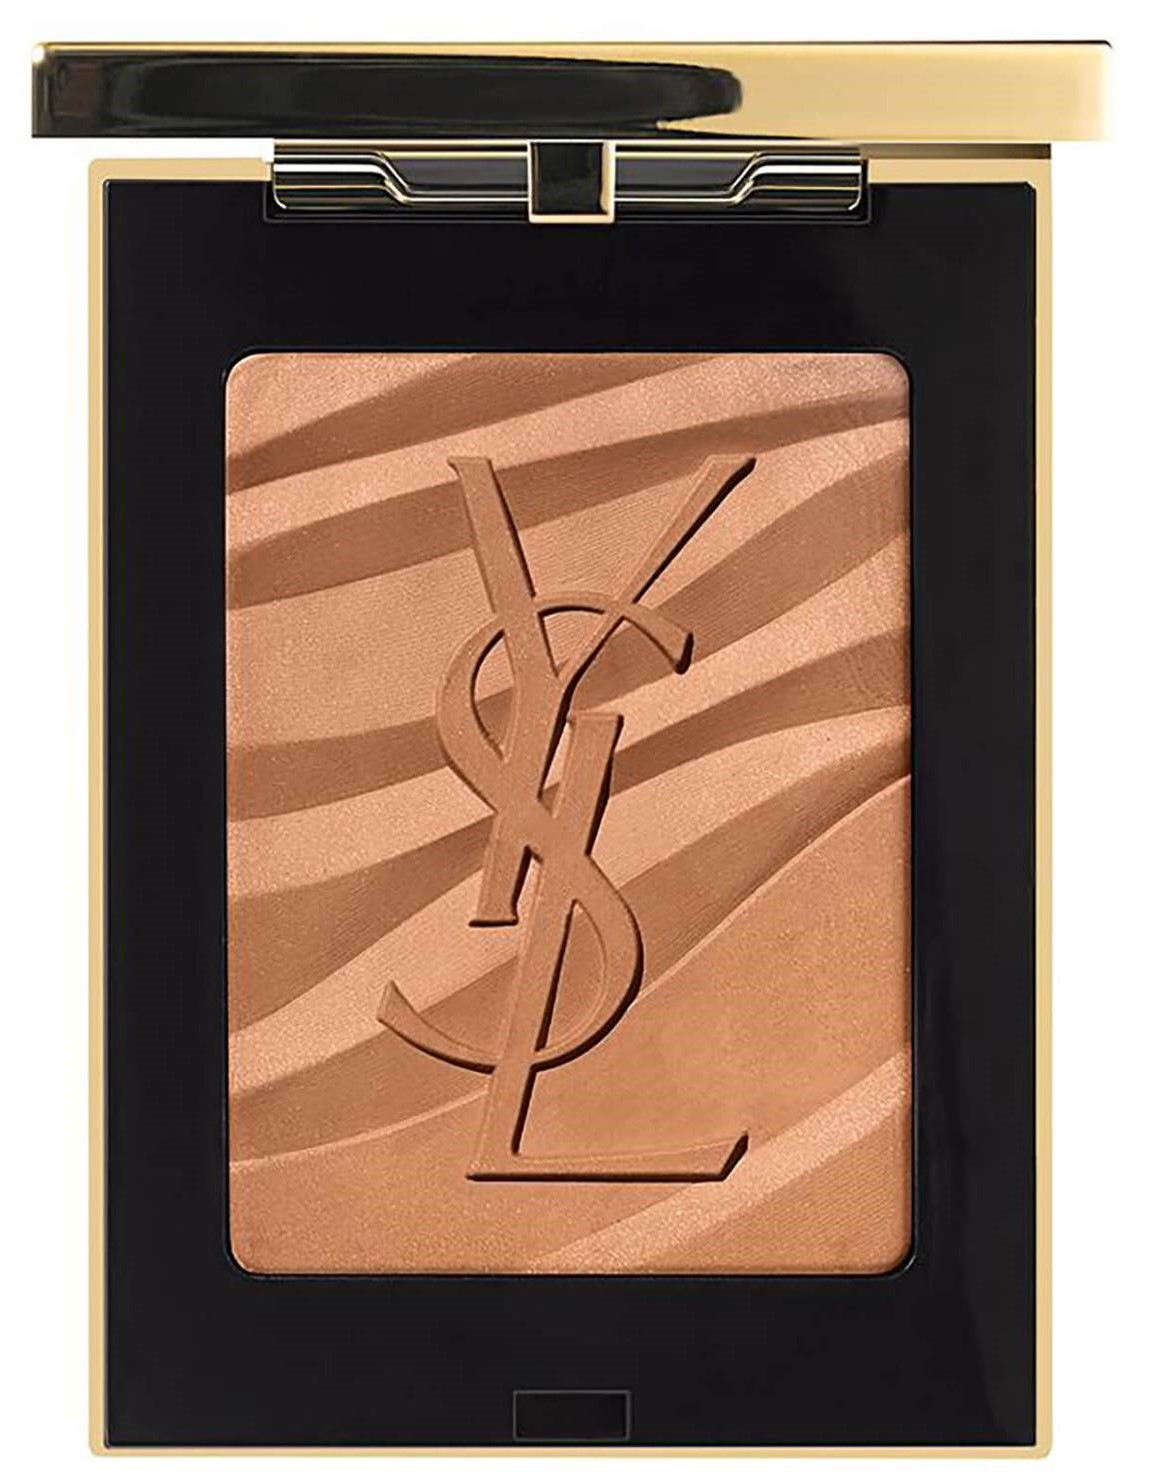 Yves Saint Laurent Les Sahariennes Bronzing Stones